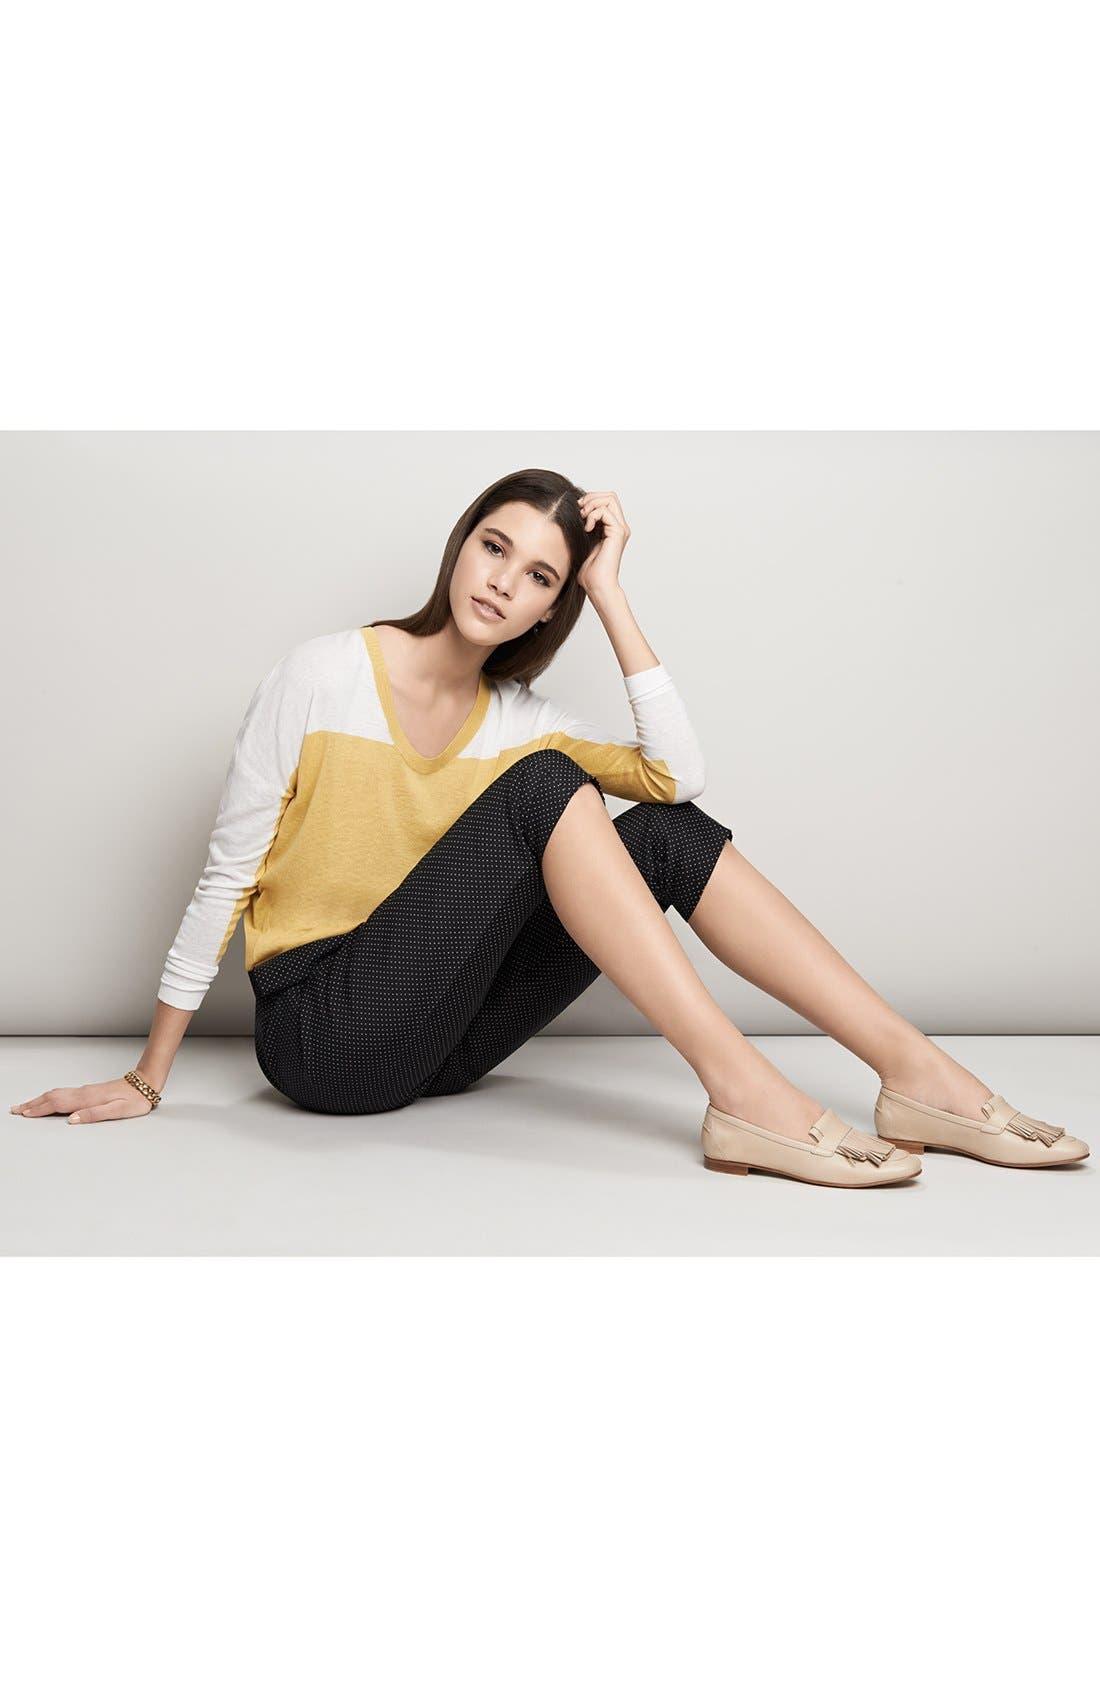 Alternate Image 1 Selected - Loma Sweater & 3.1 Phillip Lim Pants